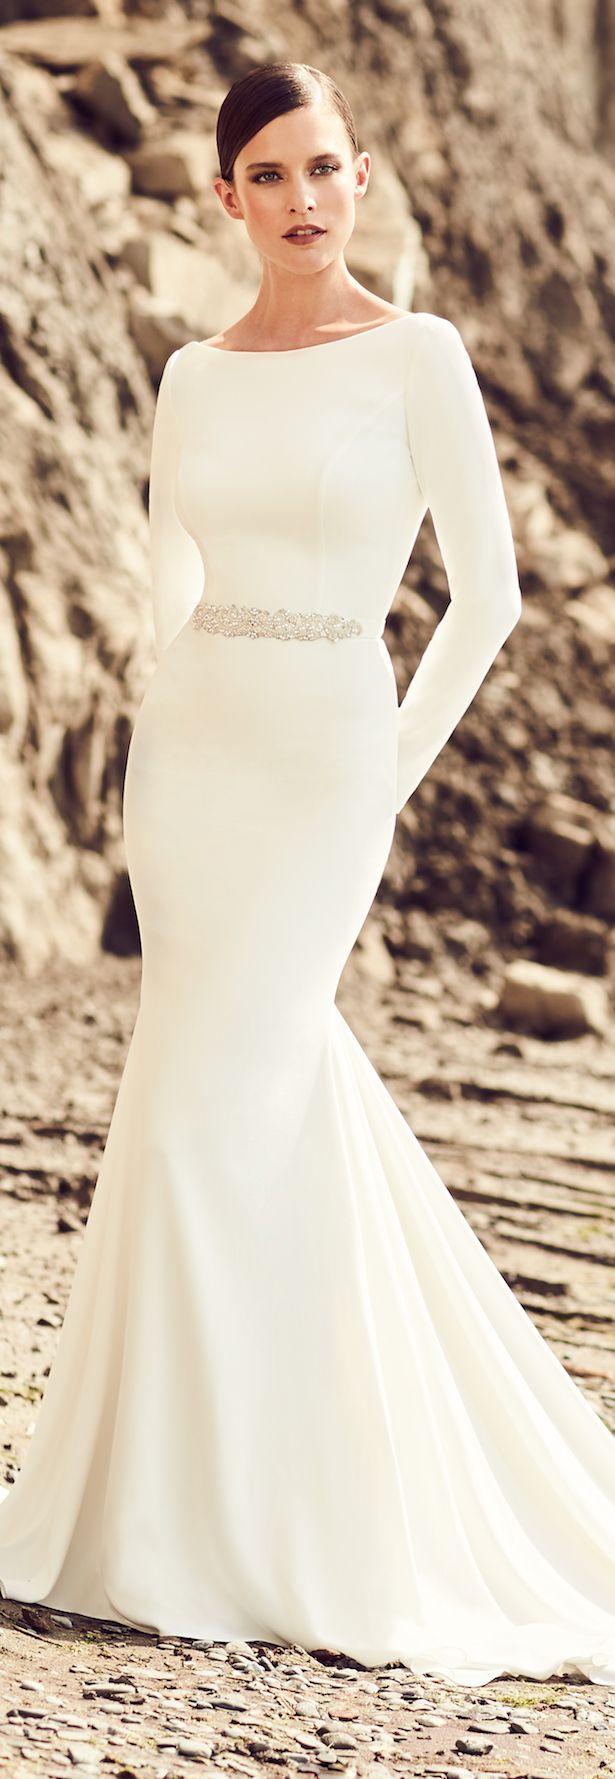 Long sleeve dresses to wear to a wedding   best Wedding Dresses images on Pinterest  Boho wedding dress